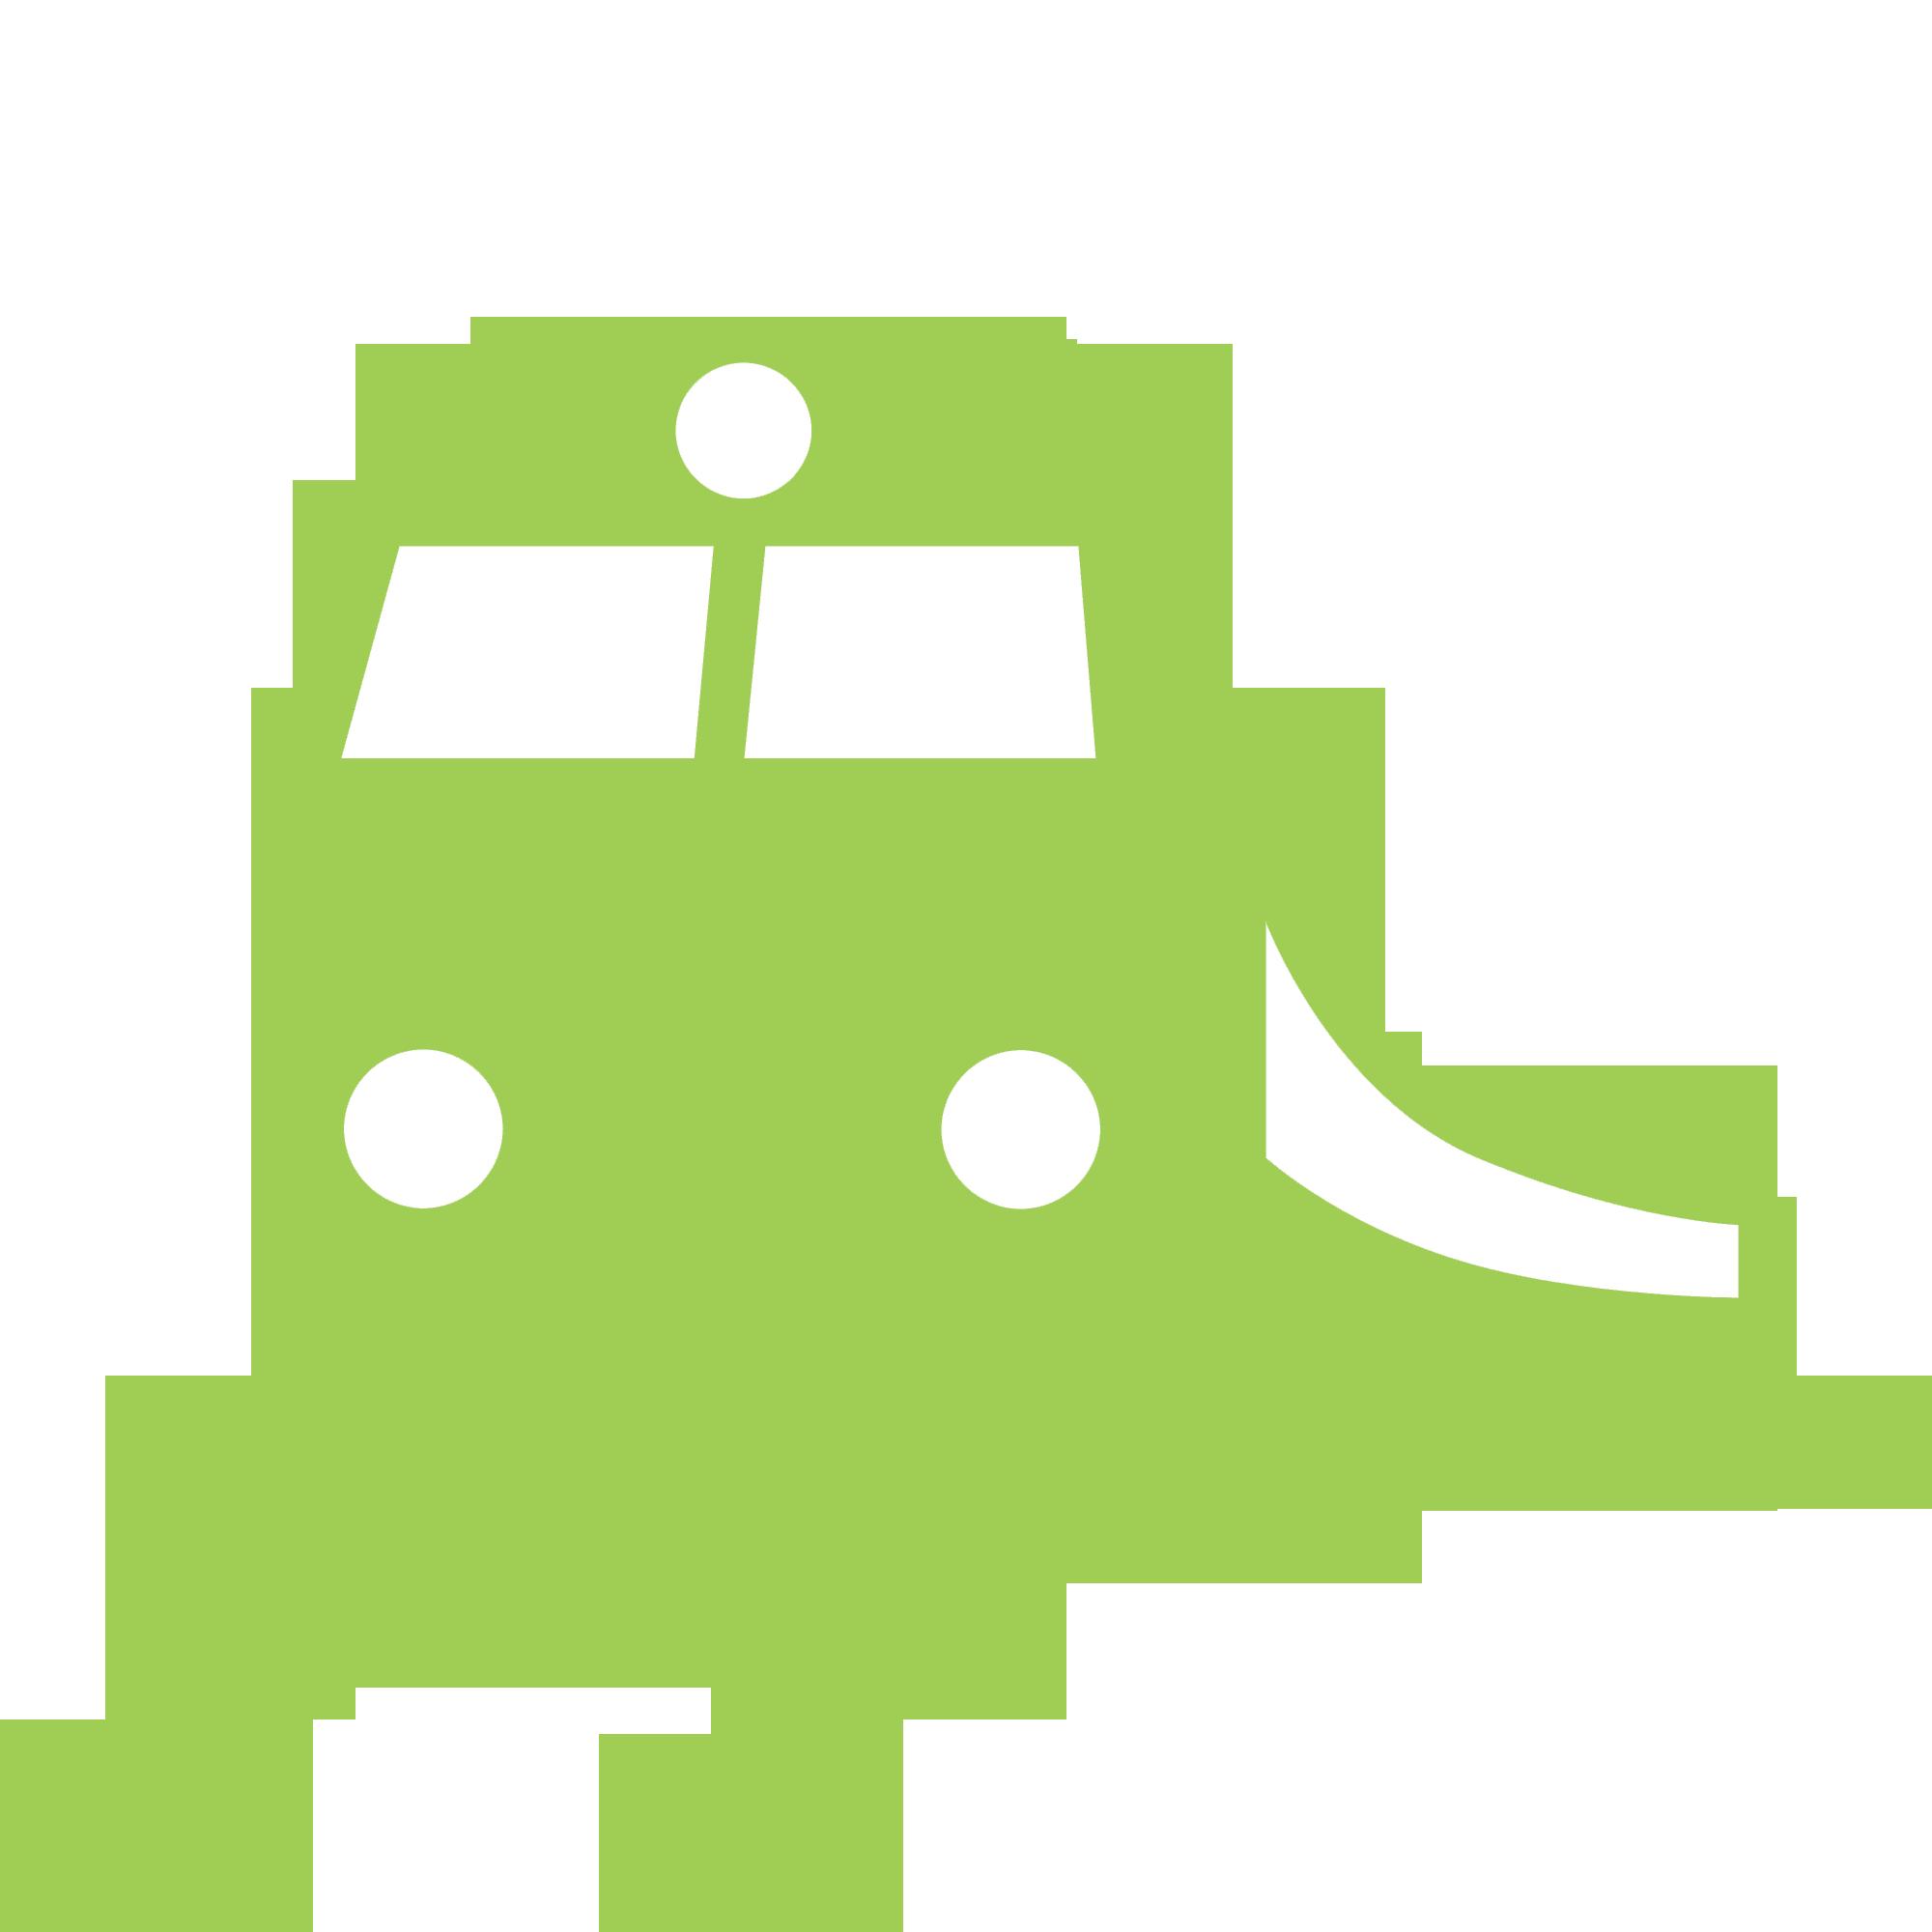 Pik2 Fasilitas - Transit Adjacent Development (TAD) Ikon